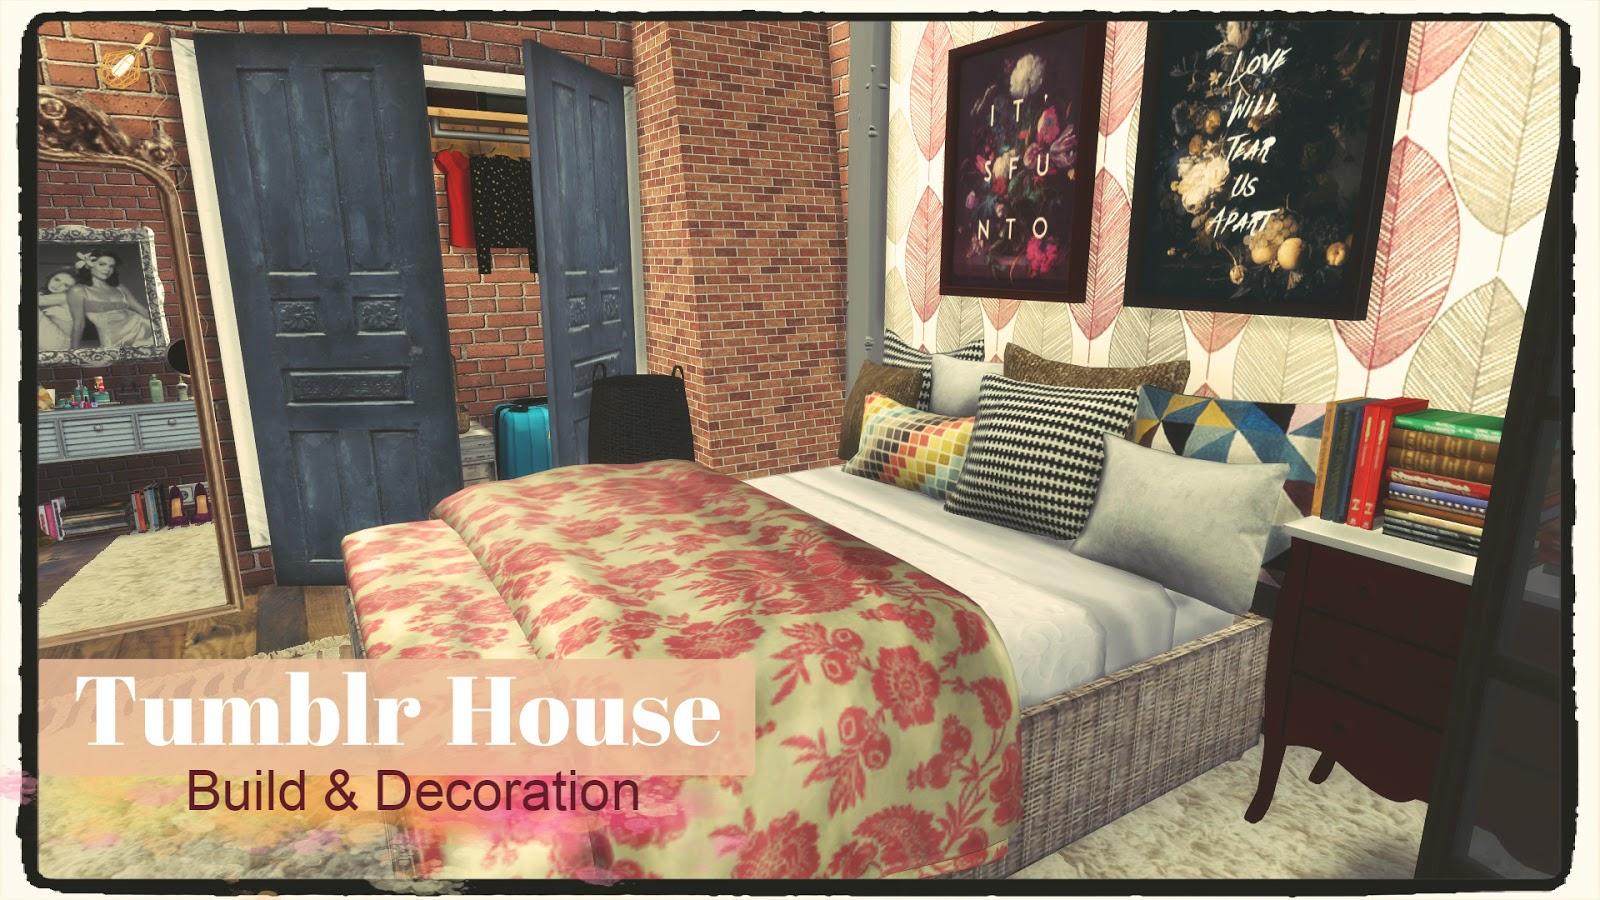 Sims 4 tumblr house dinha for Tumblr hom